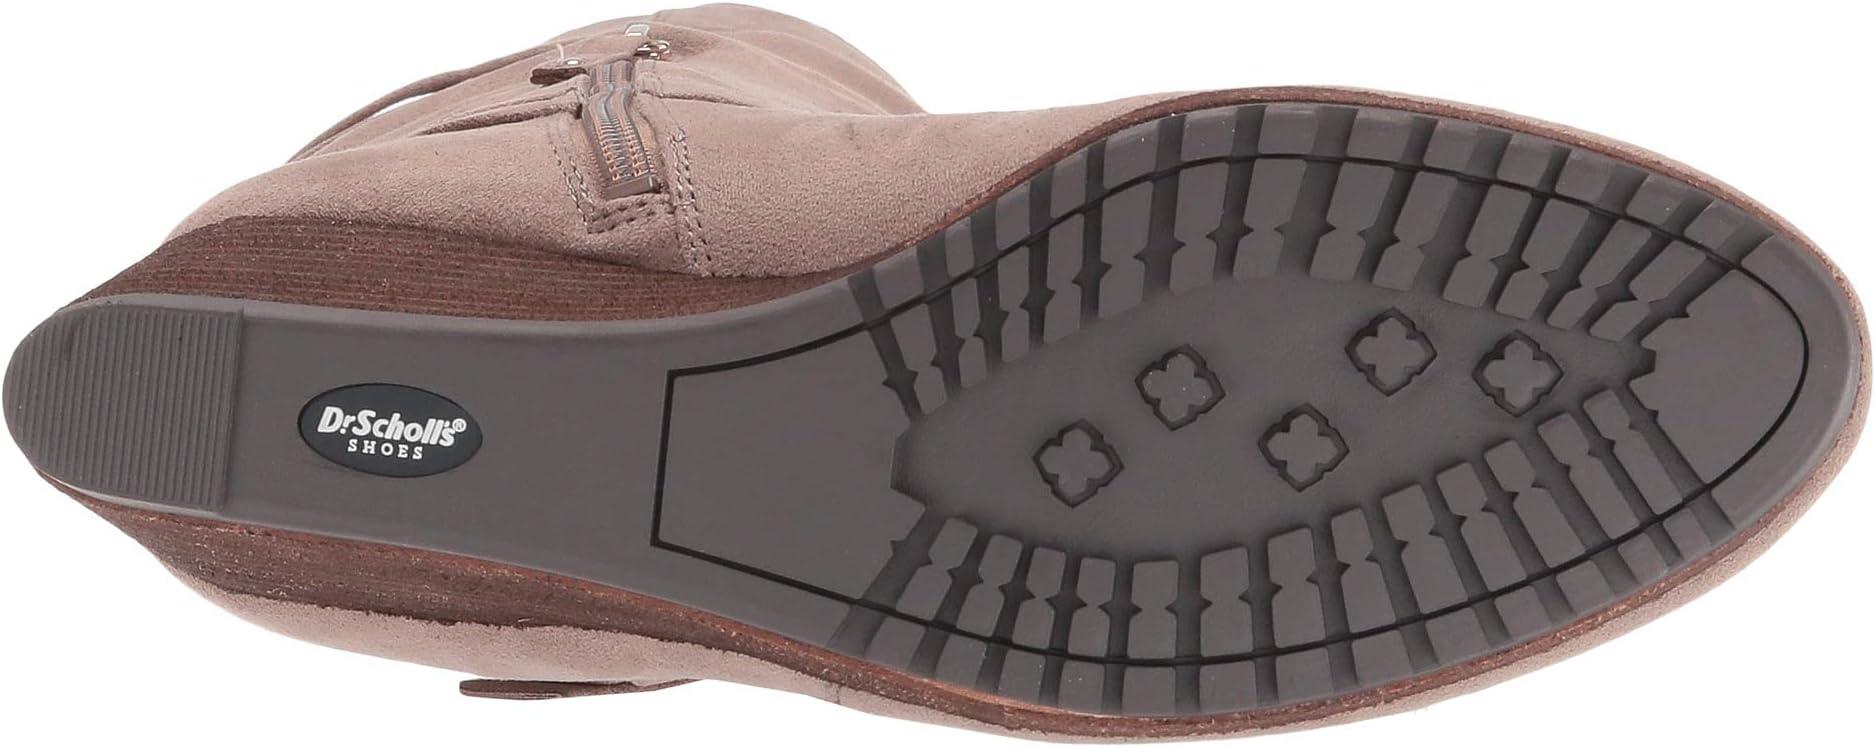 Dr. Scholl's Check It Wide Calf | Women's shoes | 2020 Newest